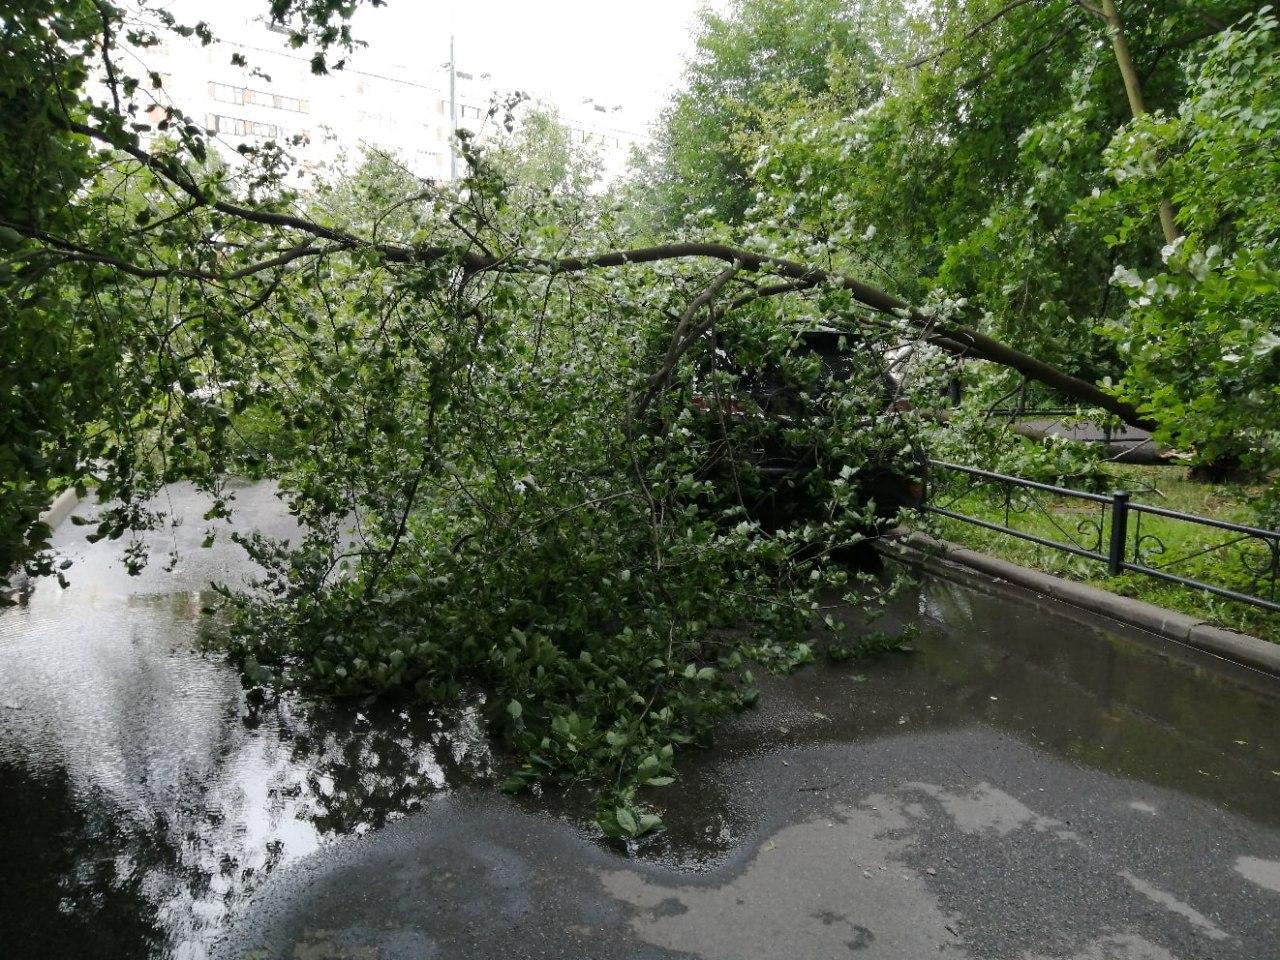 фото ЗакС политика Из-за урагана в Петербурге пострадали четыре человека